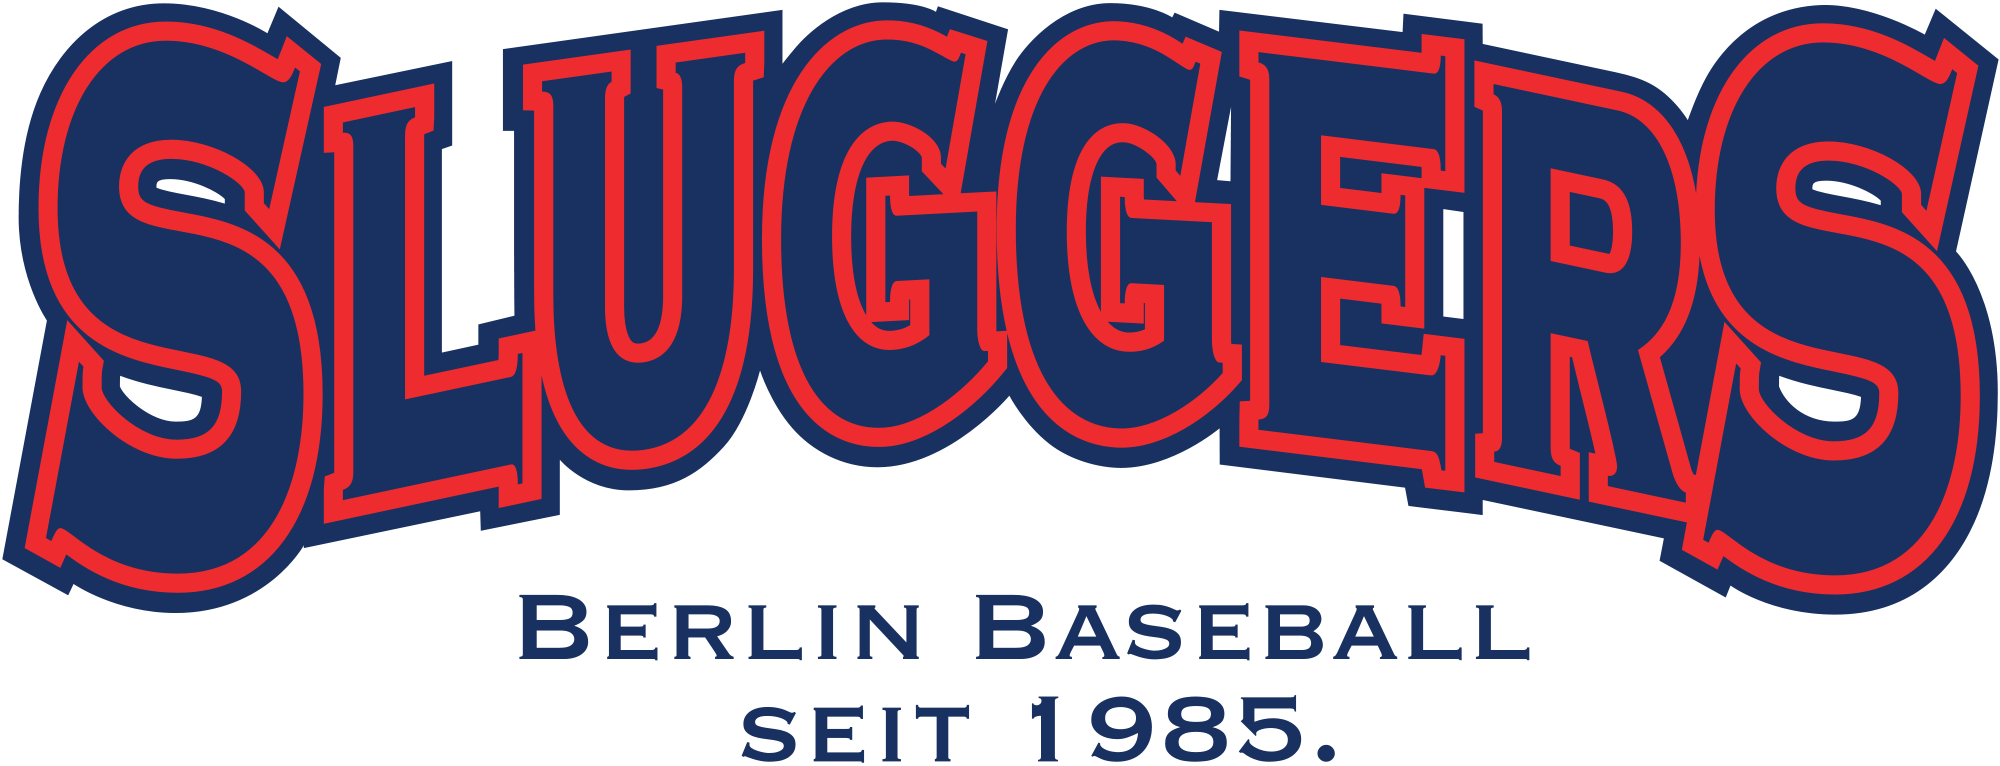 Baseball slugger clipart clipart transparent stock File:Berlin Sluggers Logo.svg - Wikimedia Commons clipart transparent stock